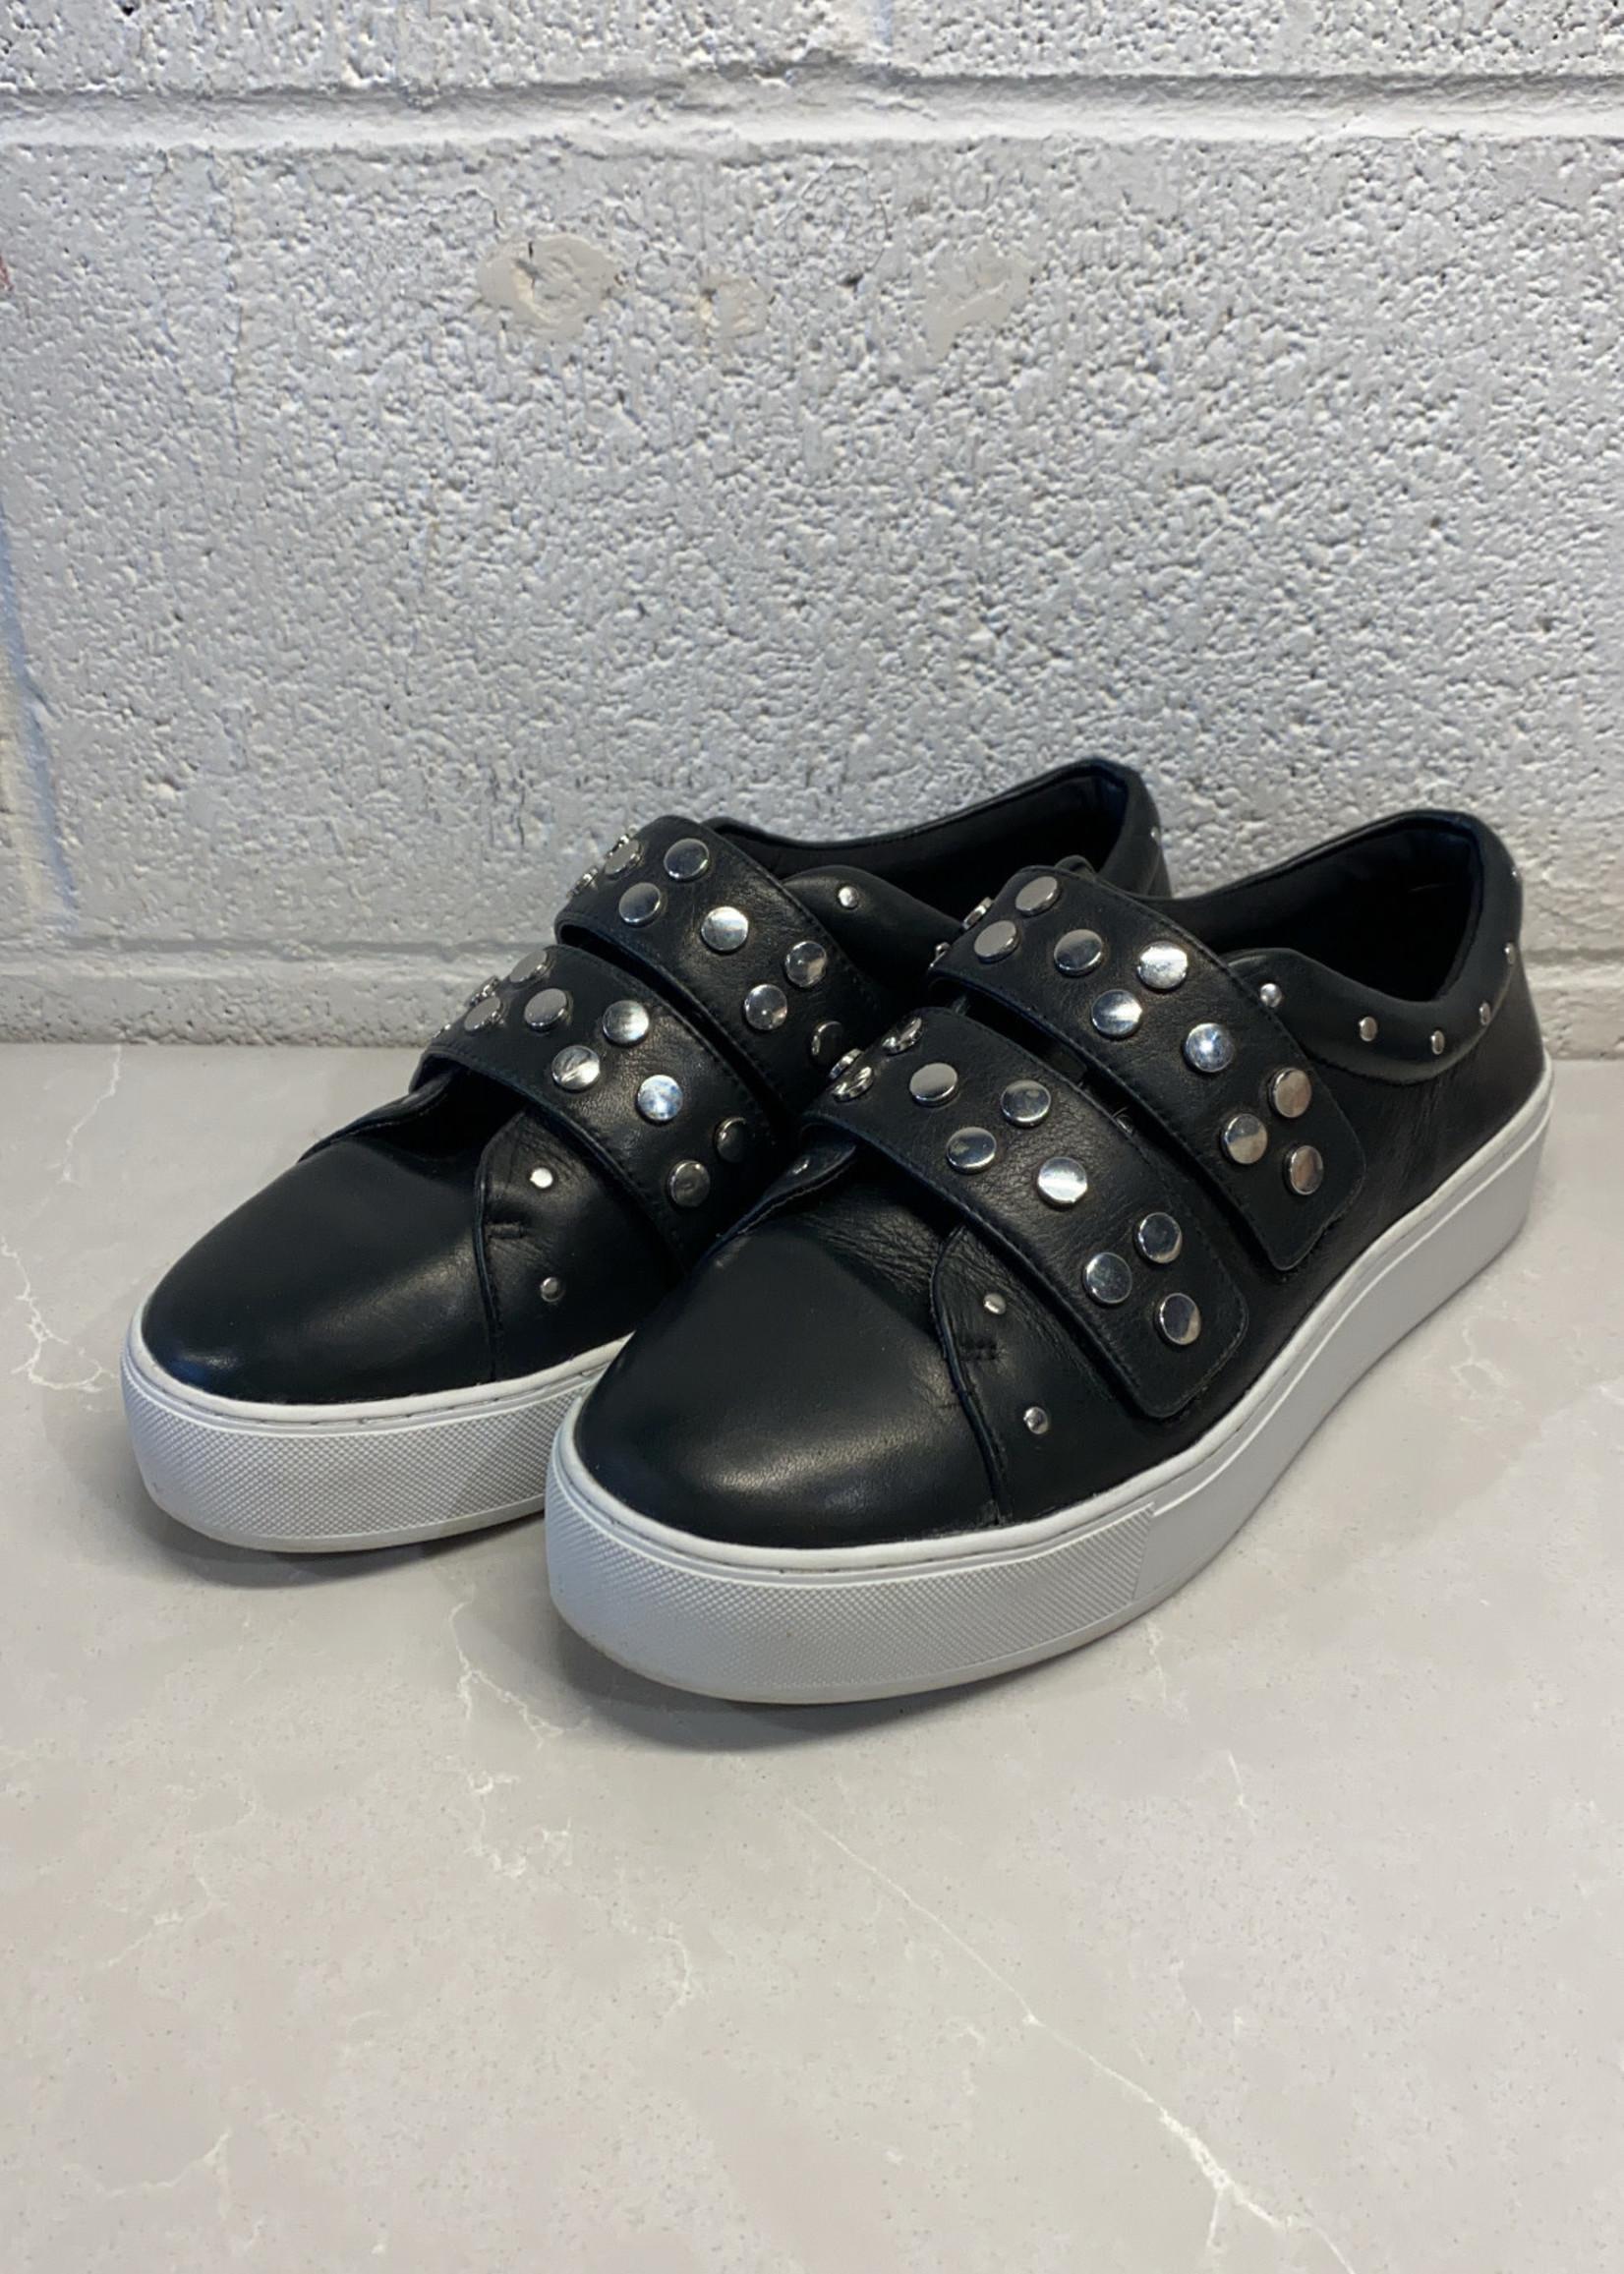 Rebecca Minkoff Platform Studded Sneakers 9